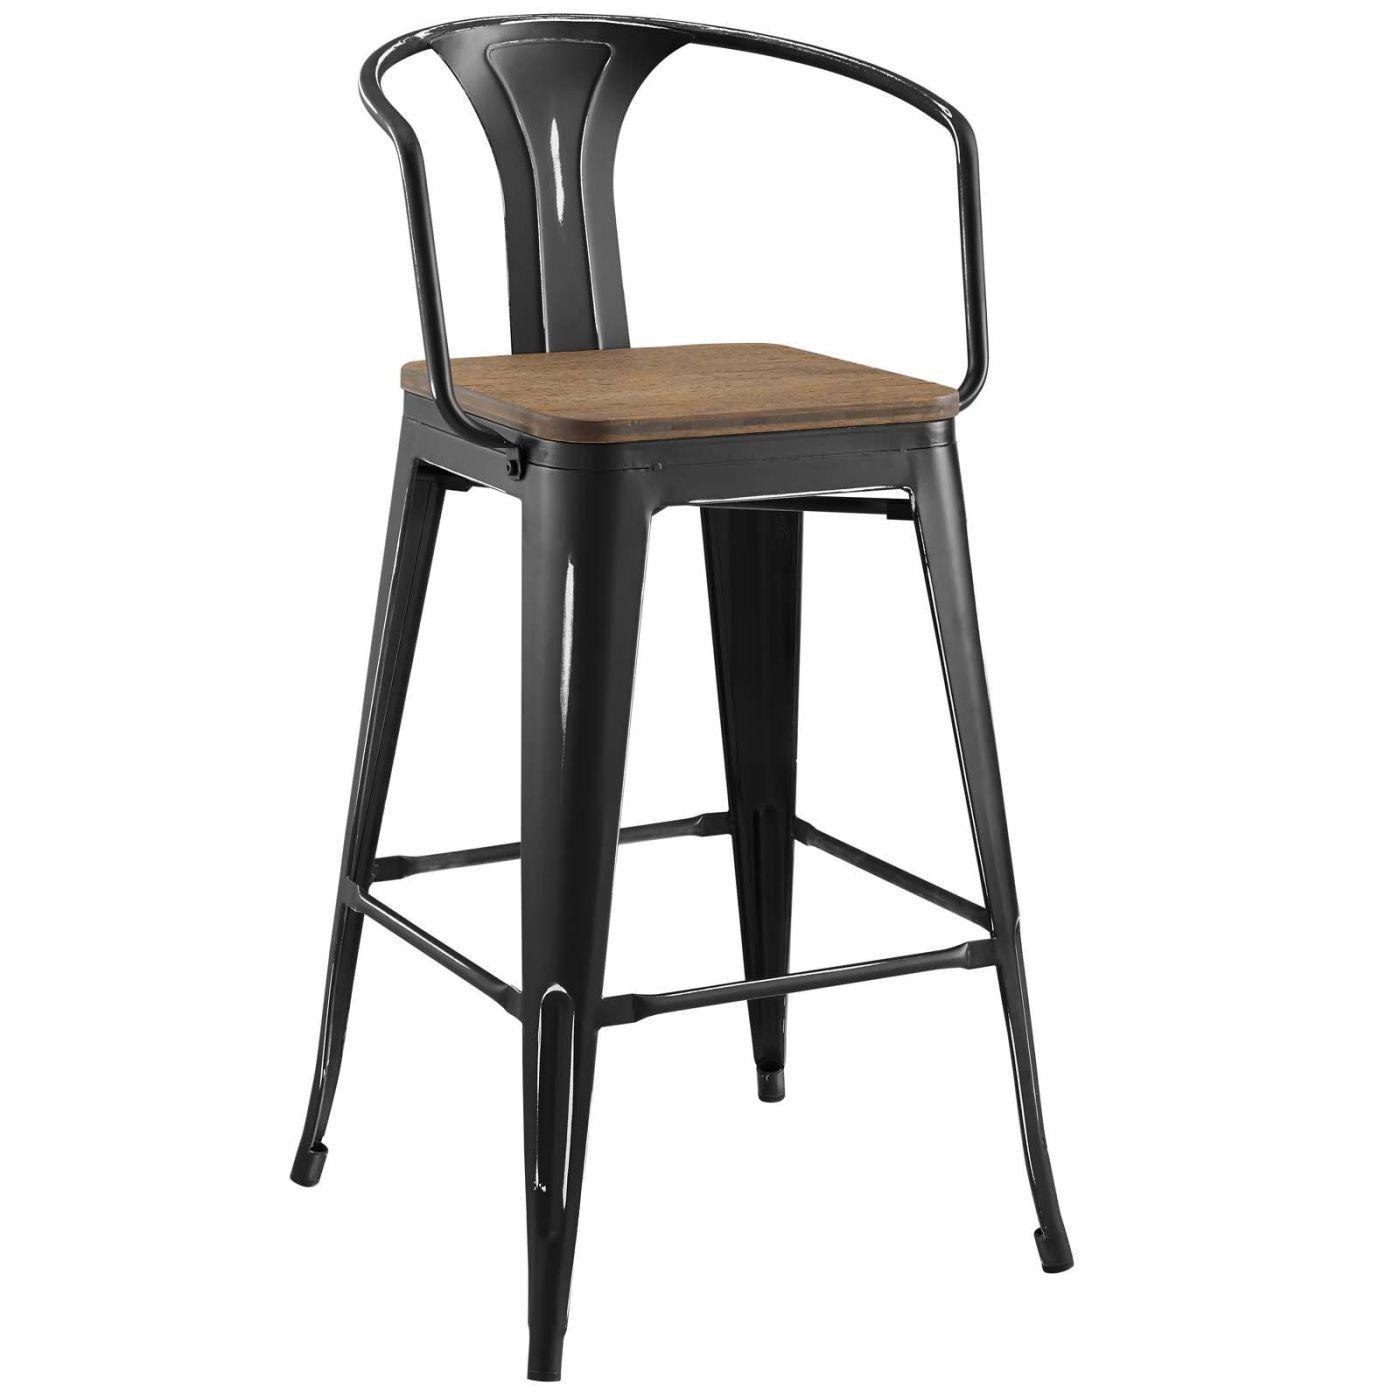 Fine Modway Bar Chairs On Sale Eei 2818 Whi Promenade Cafe And Inzonedesignstudio Interior Chair Design Inzonedesignstudiocom